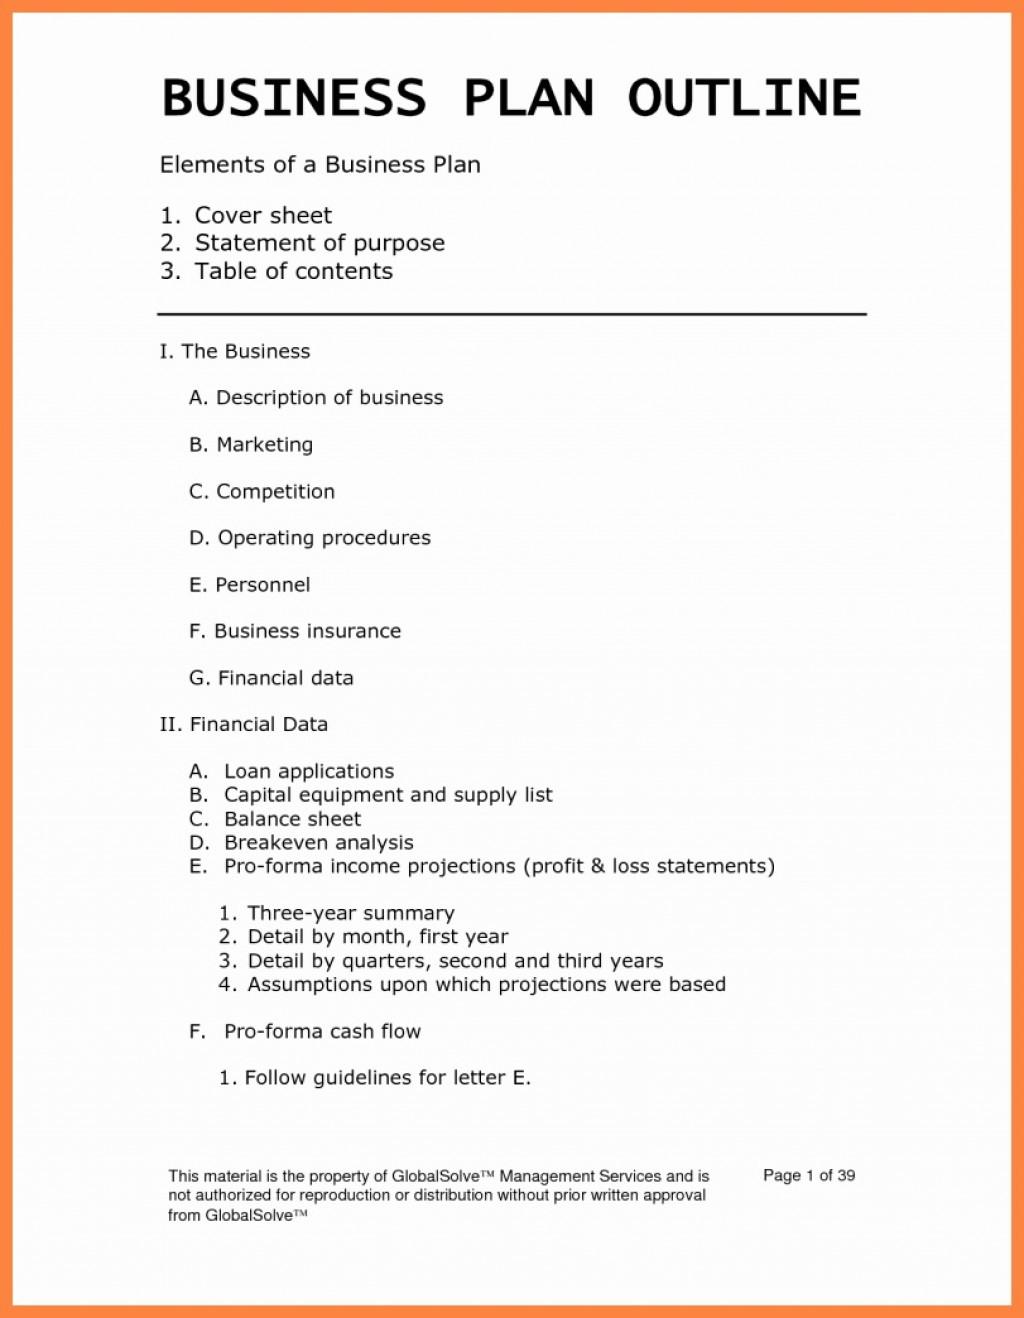 003 Top Busines Plan Template Pdf Image  Restaurant Sample Free Example Uk DocLarge